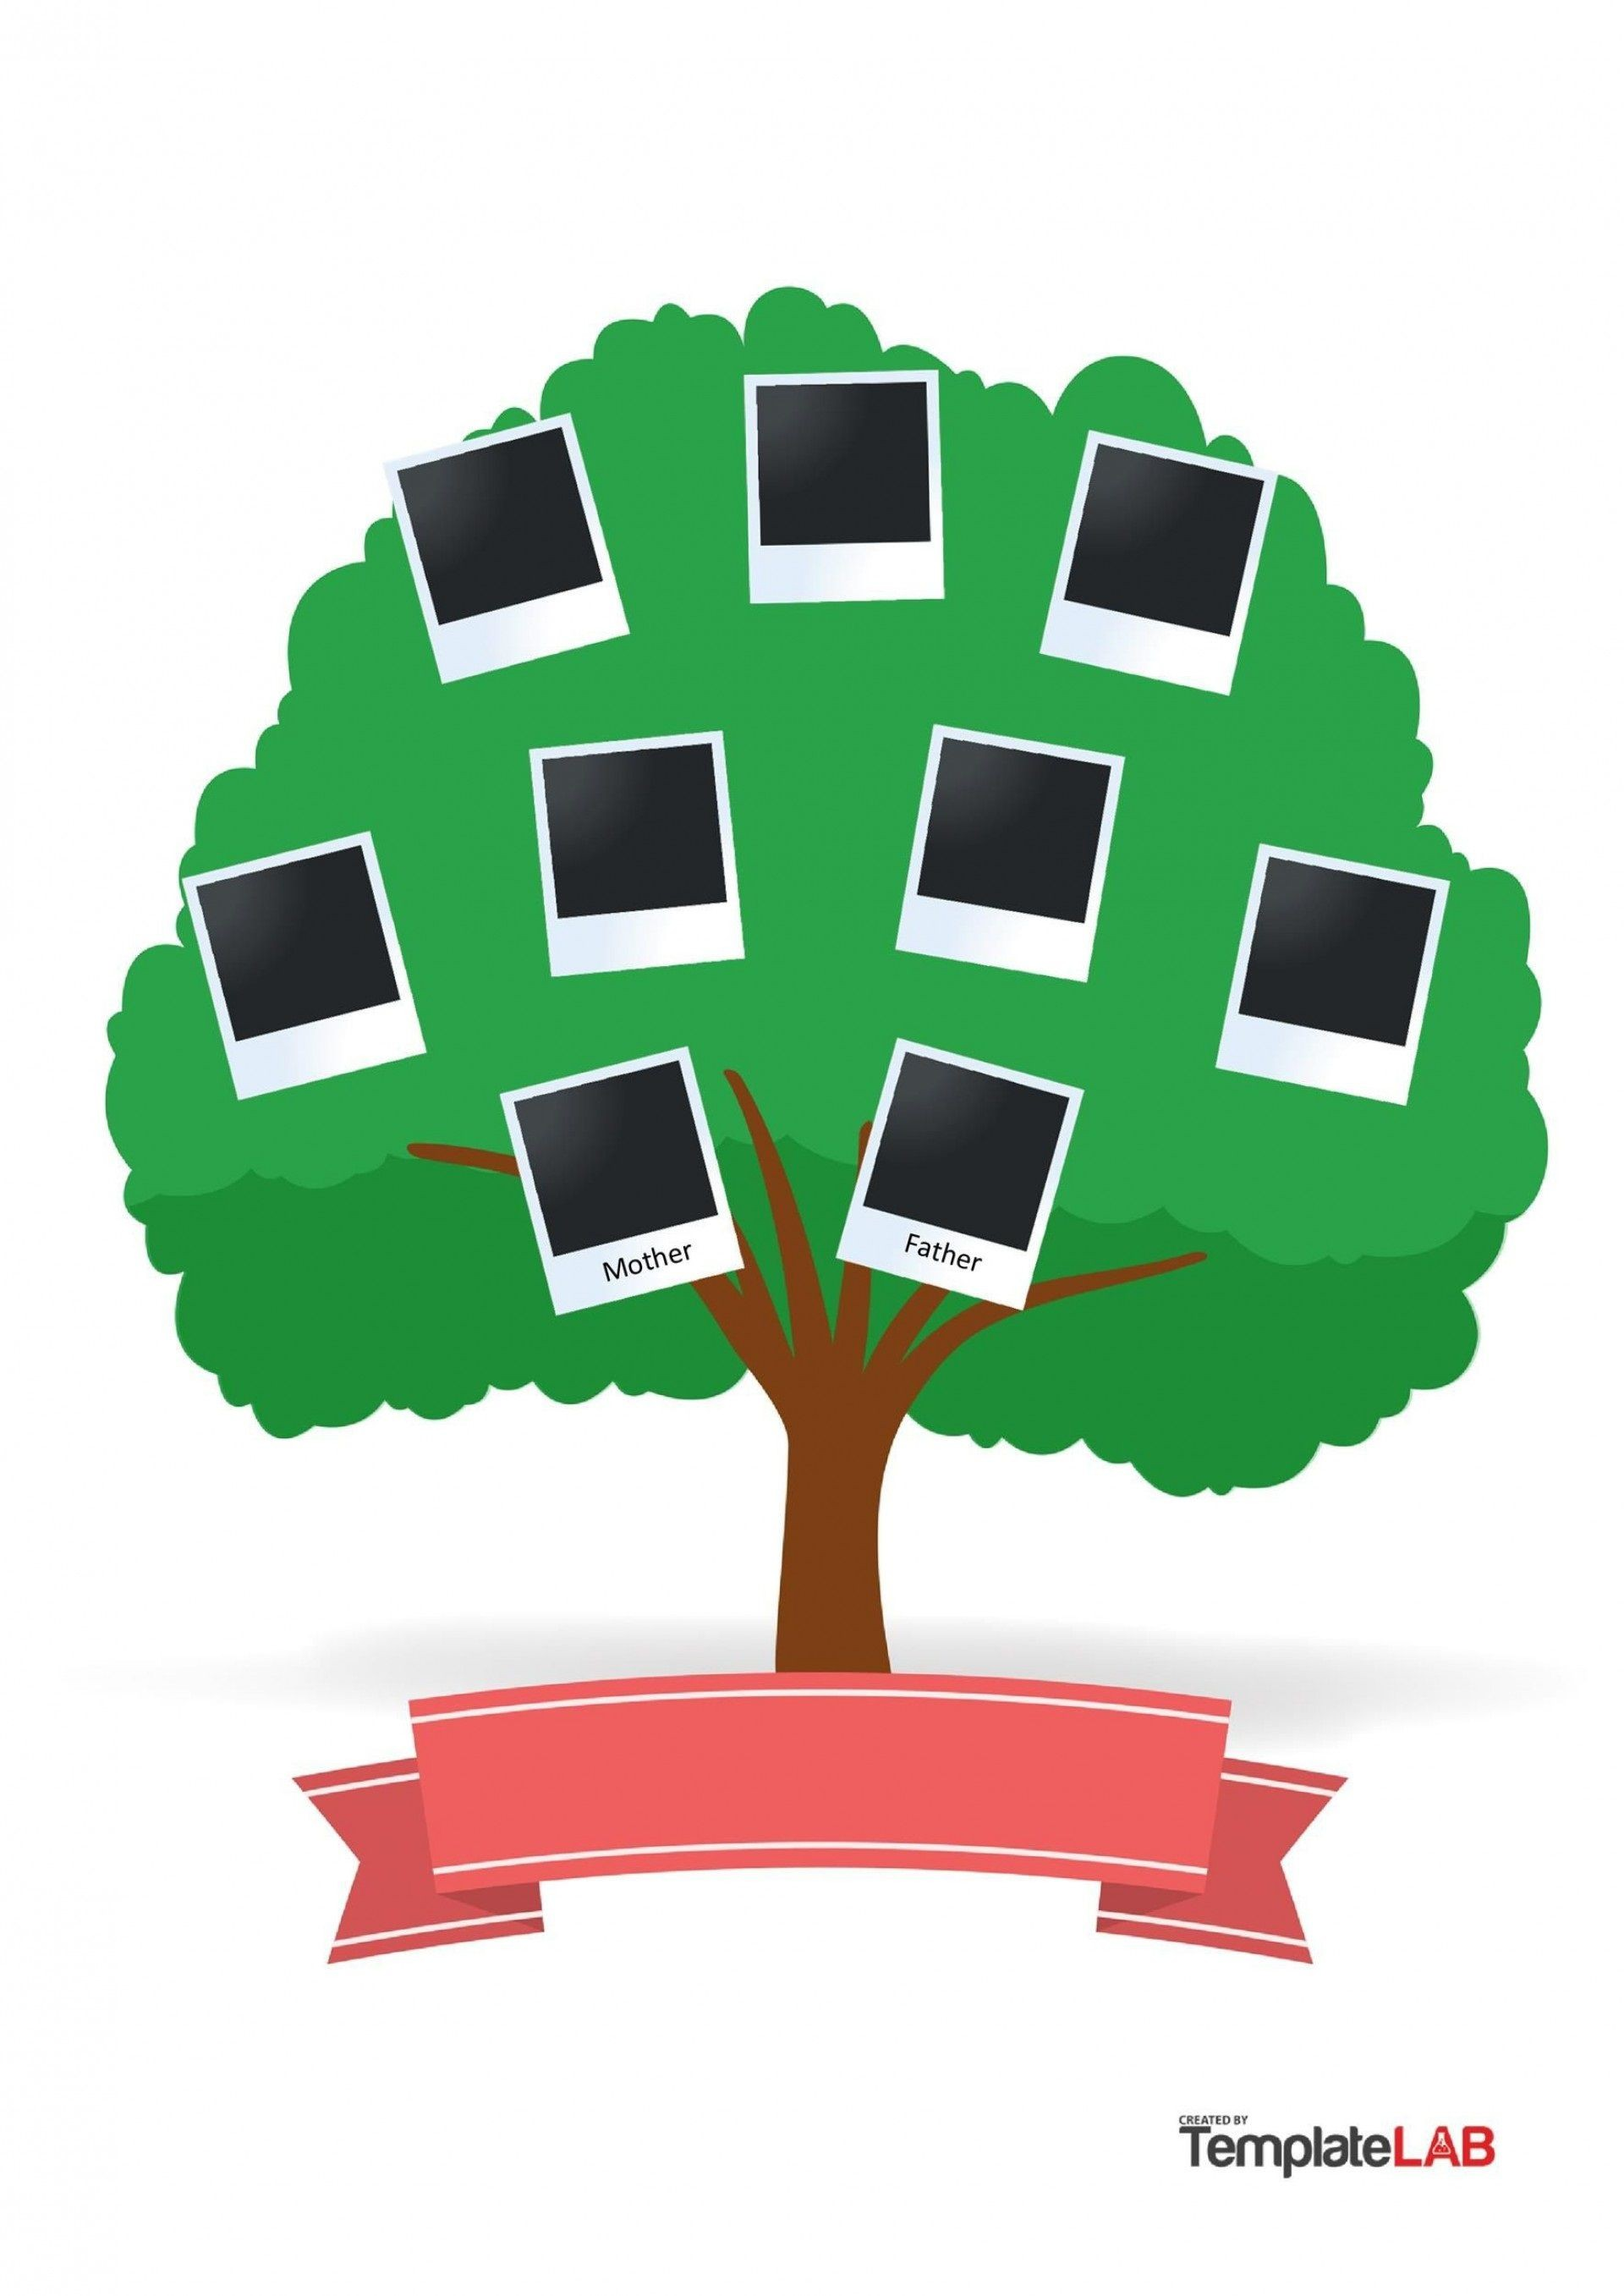 008 Fantastic Free Editable Family Tree Template For Mac Image 1920